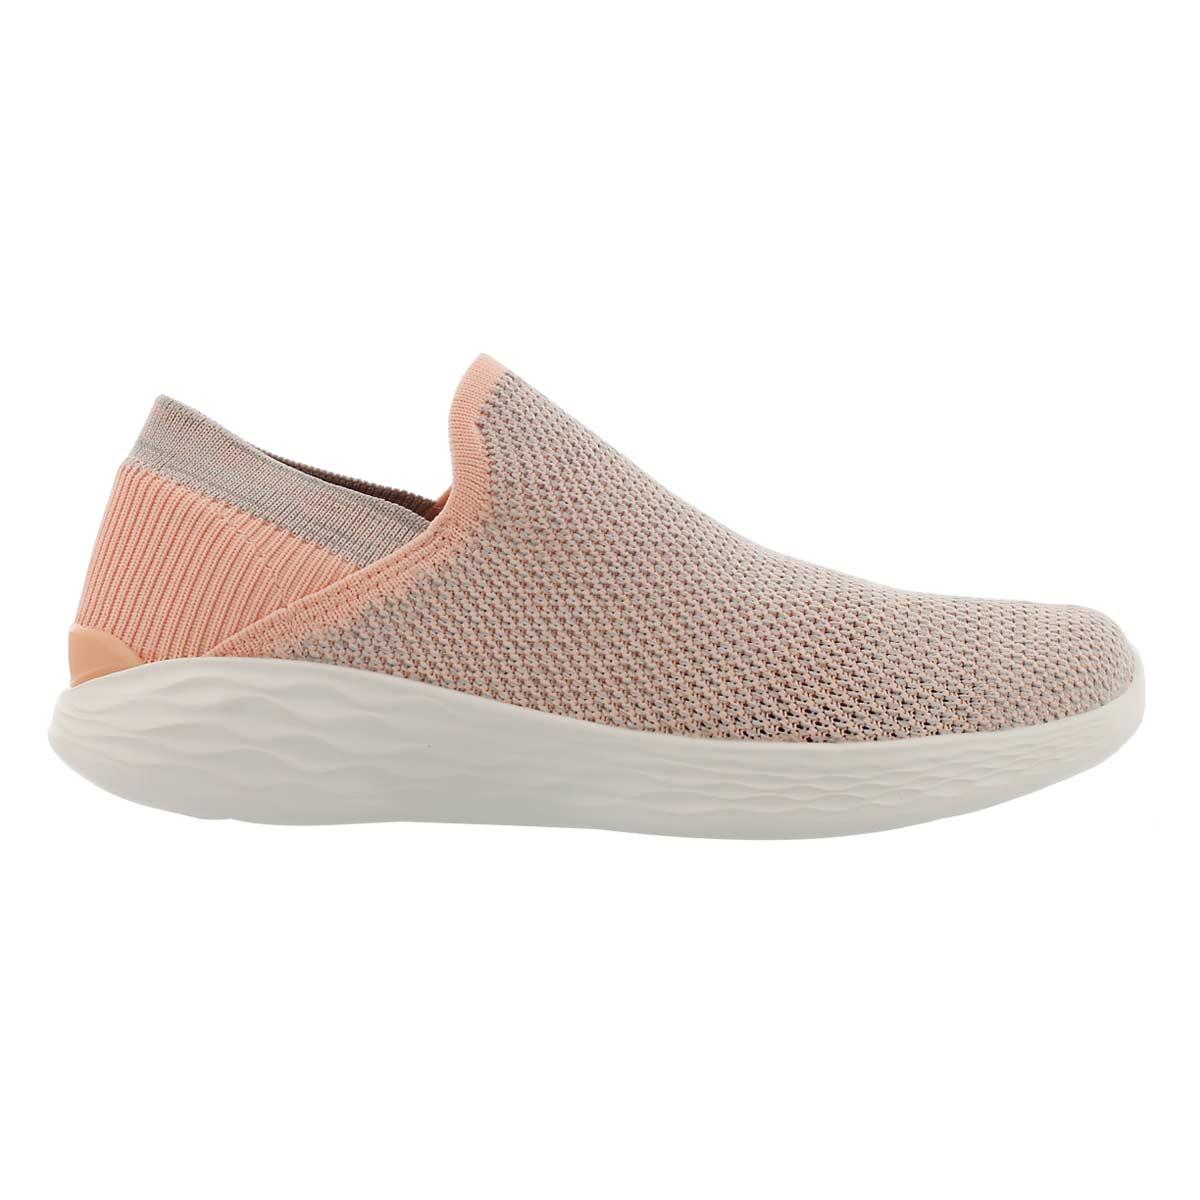 Lds You Rise peach slip on walking shoe